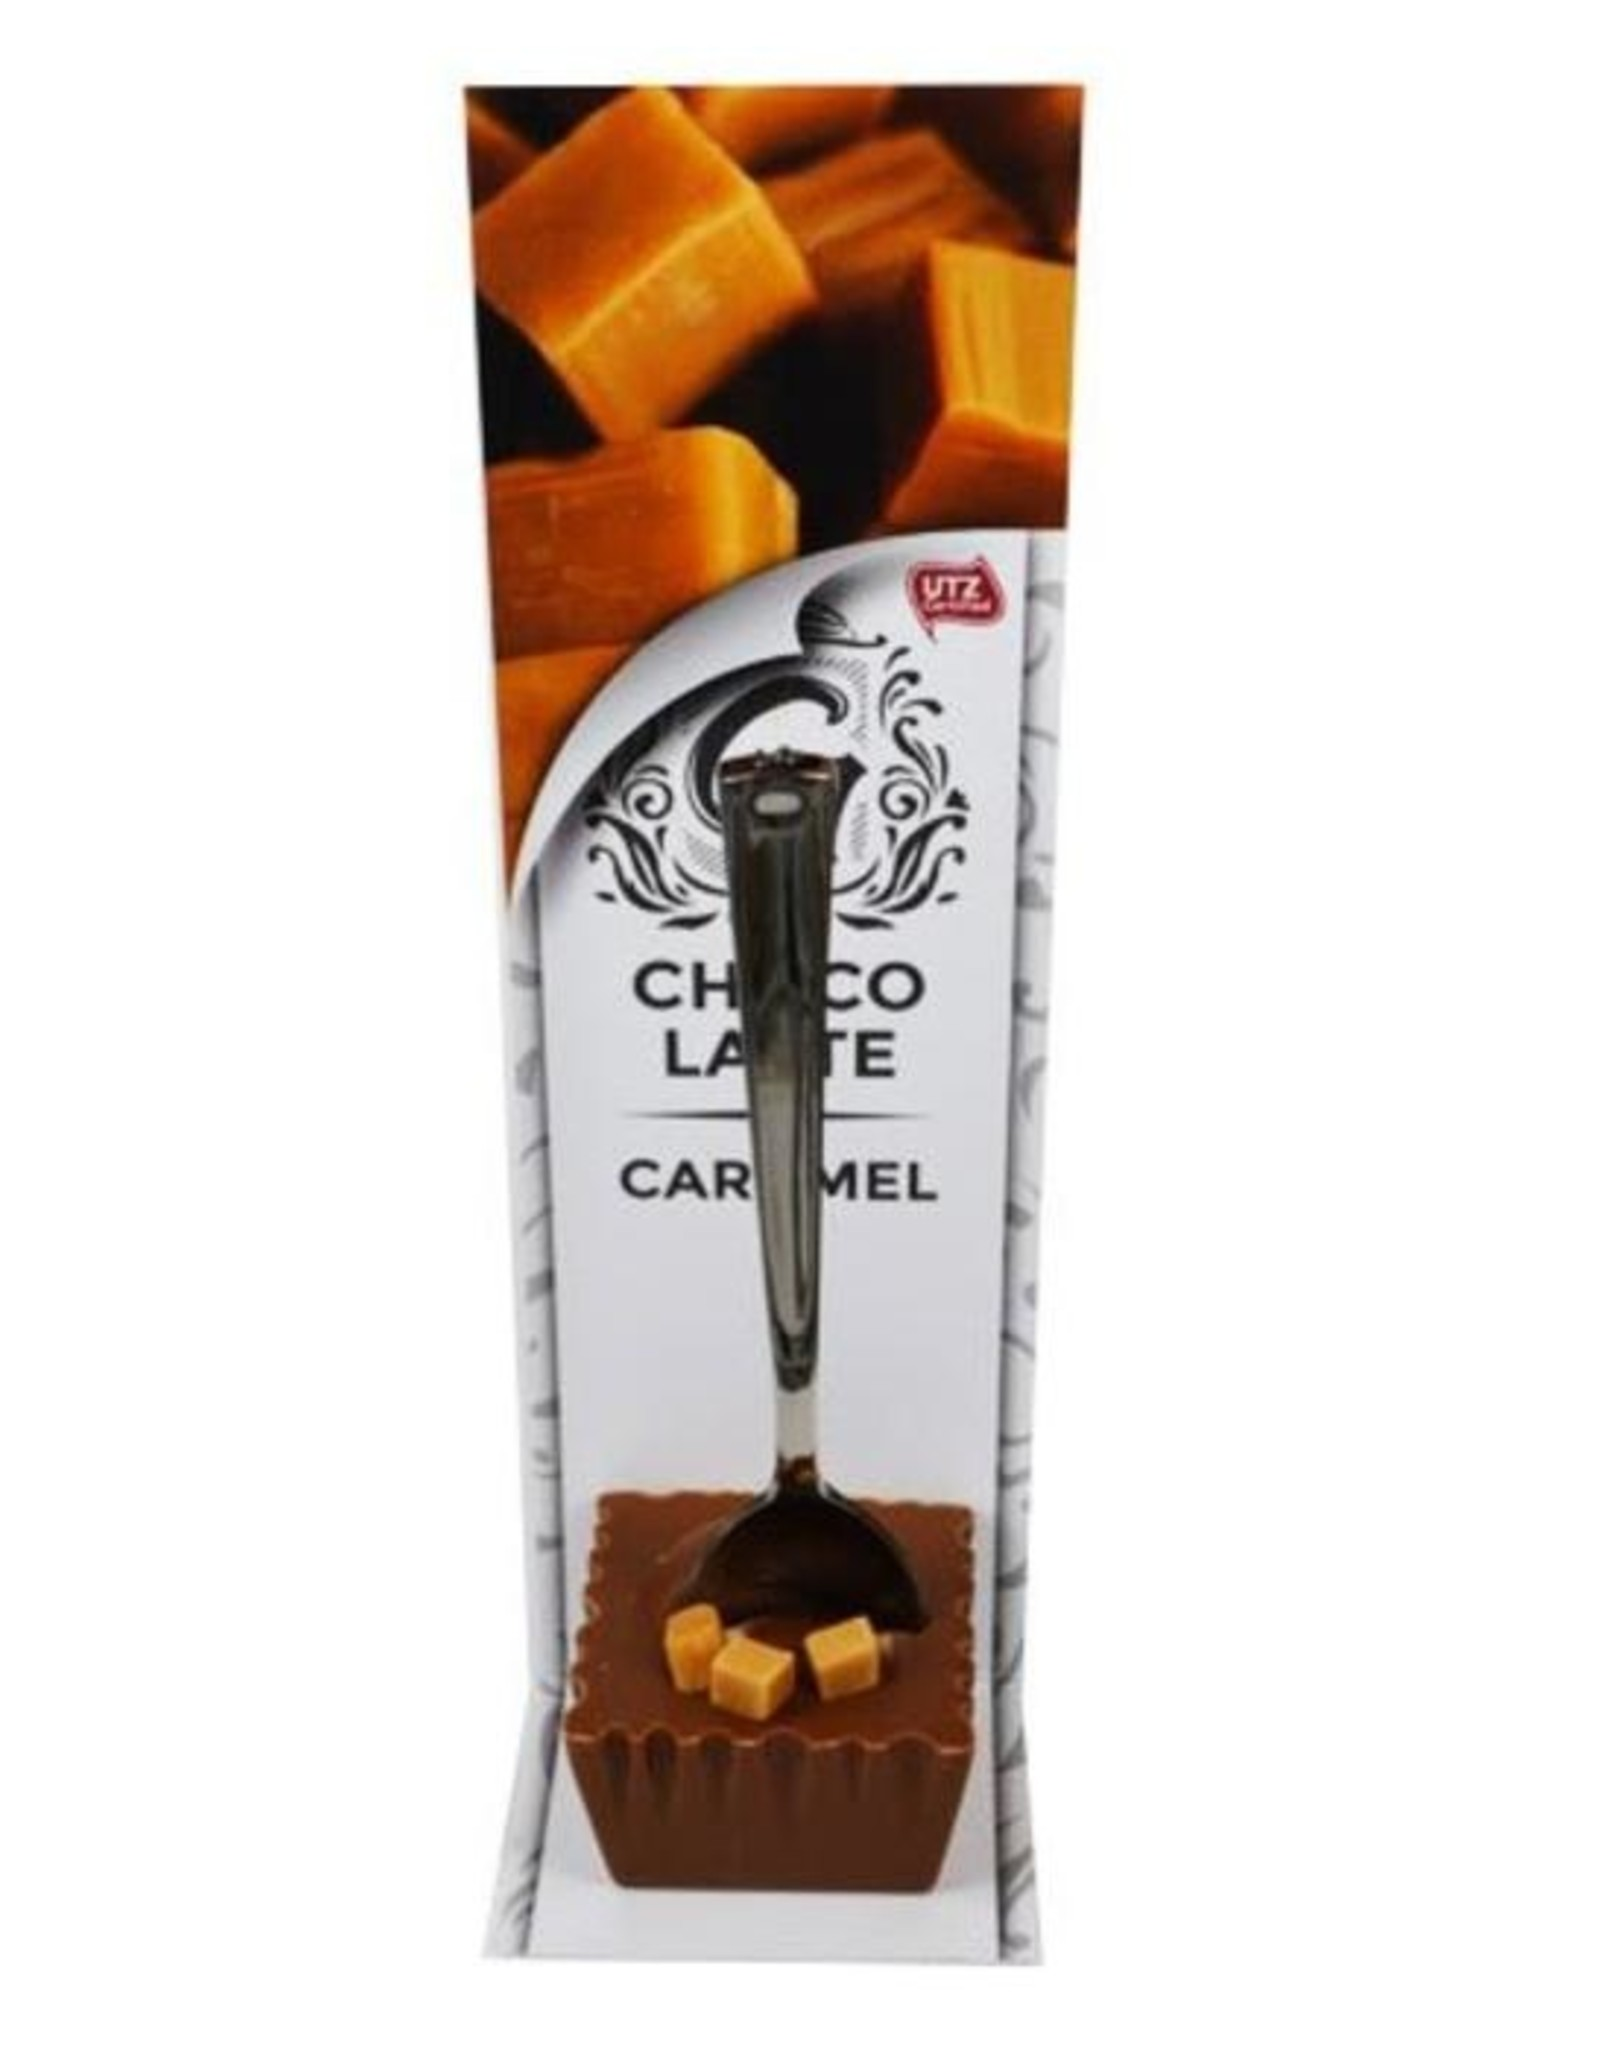 Choco Latte Melkchocolade